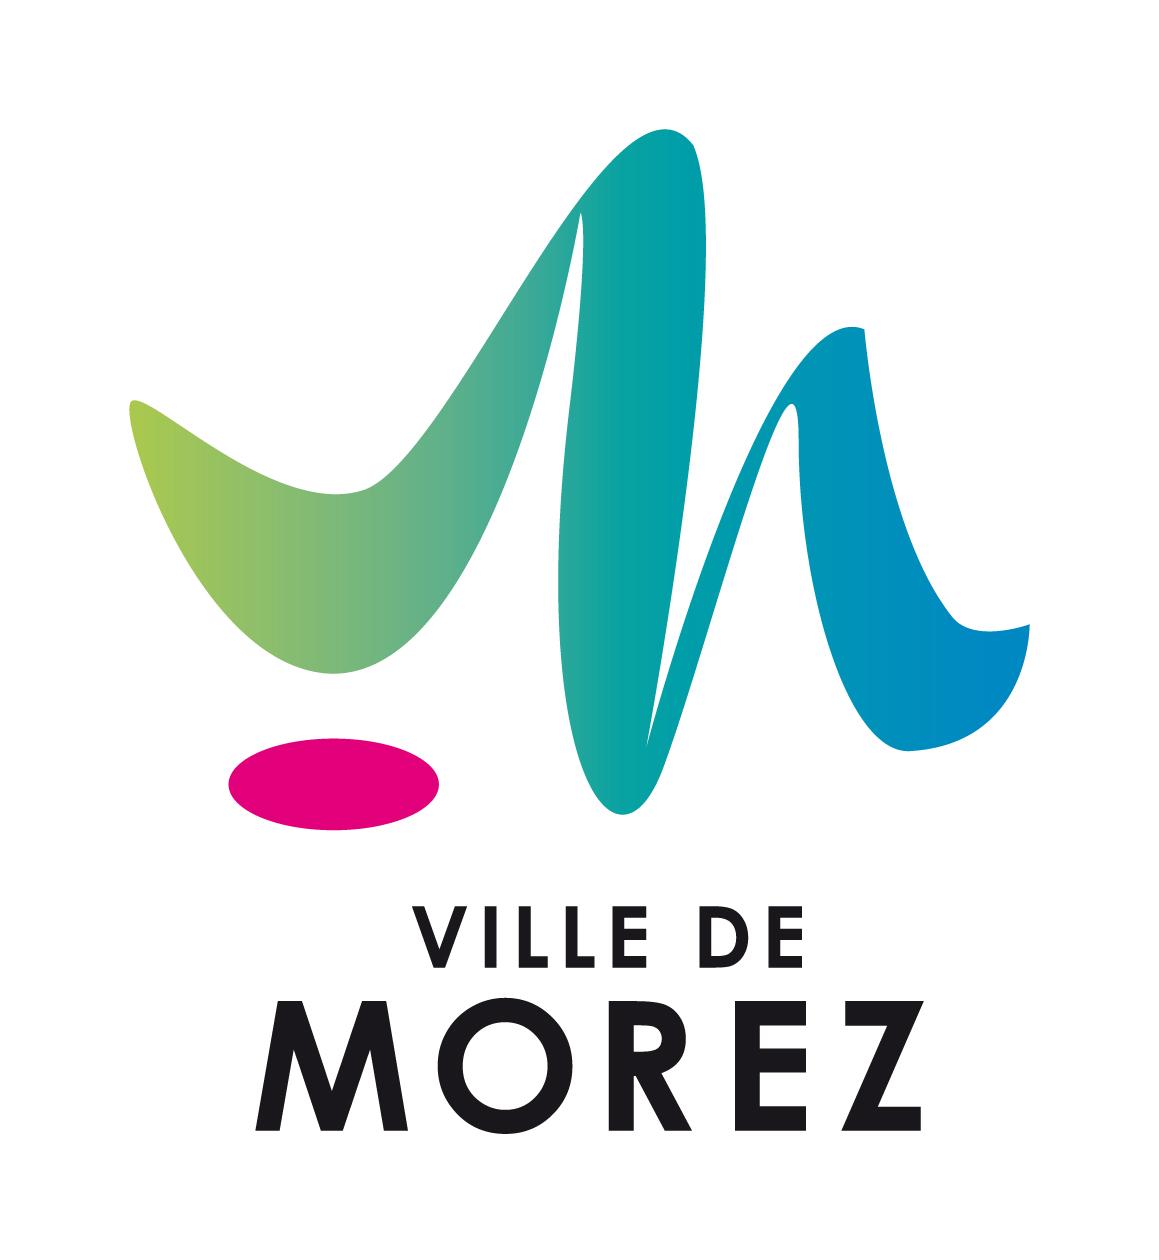 Lodo ville Morez